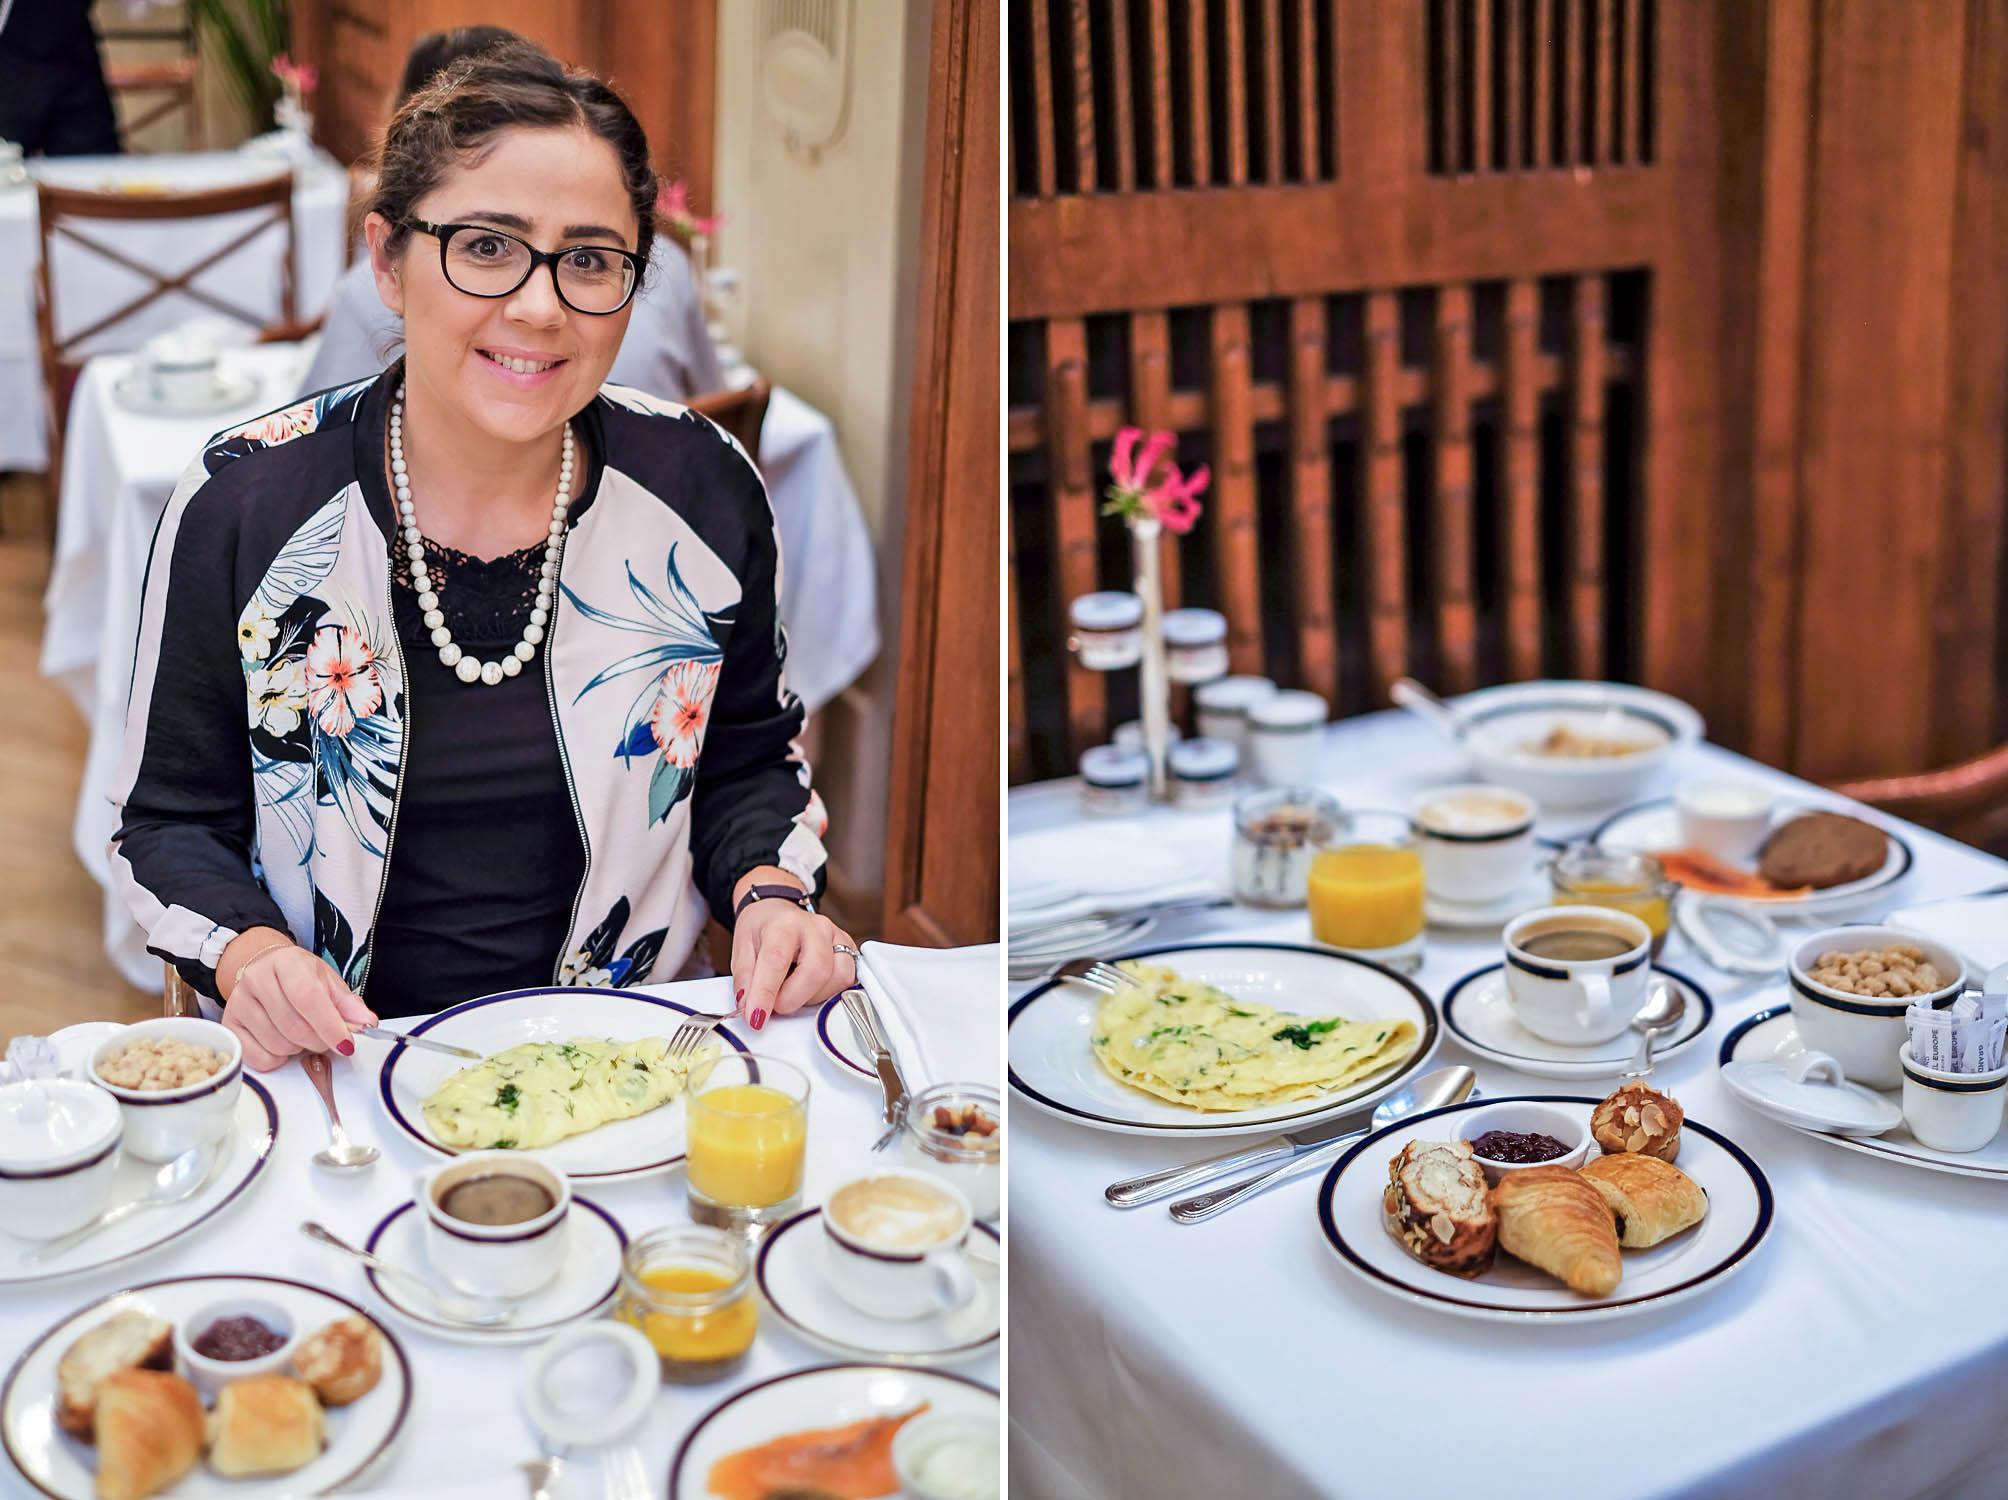 Breakfast at L'Europe Restaurant | Belmond Grand Hotel Europe in Saint Petersburg, Russia #mondomulia